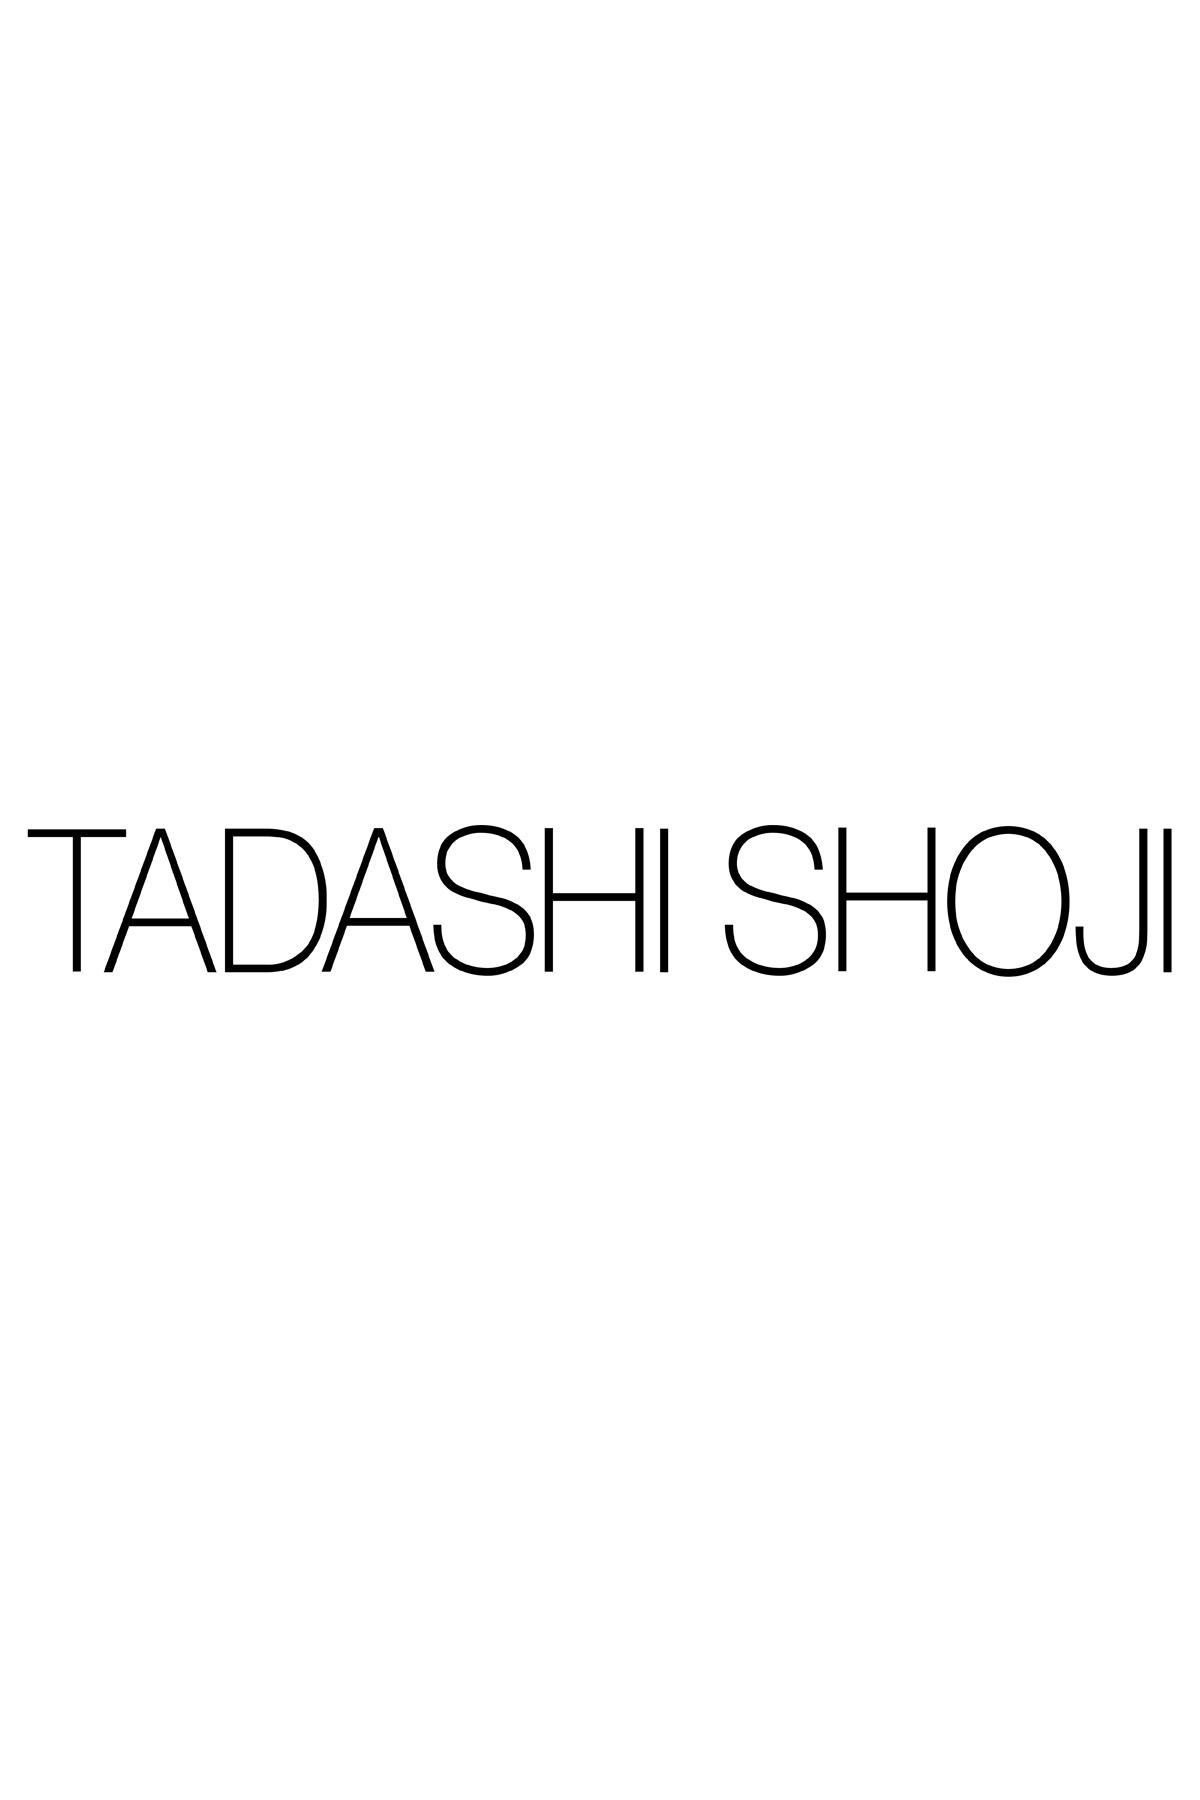 Tadashi Shoji Detail - Ripley Gown